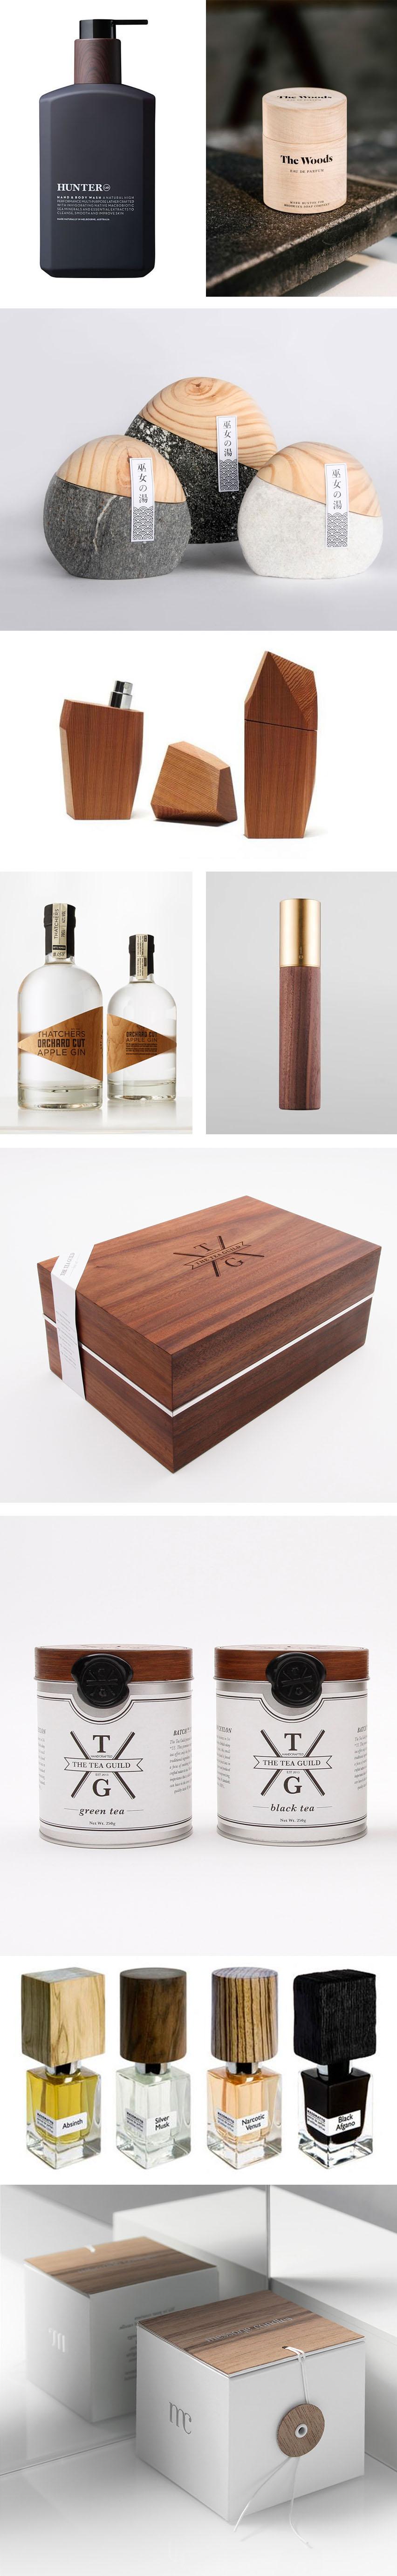 Wood packaging at Förpackad